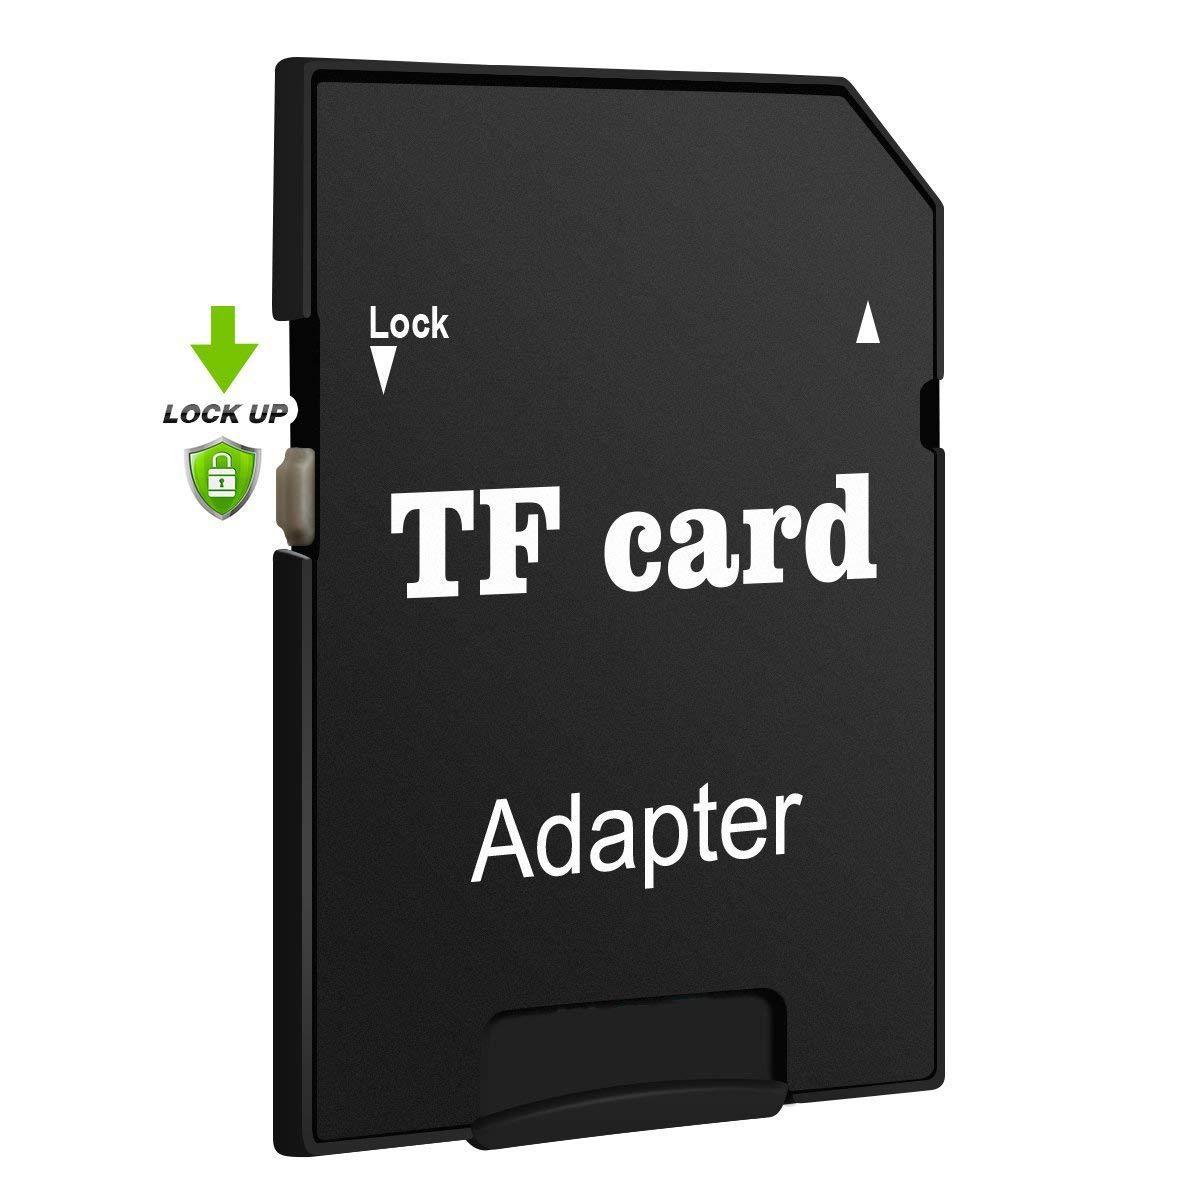 POPRUN 64 GB Micro SD Karte Class 10 Speicherkarte TF Karte SD-Karte Speicher Memory Card mit SDHC Adapter Schwarz